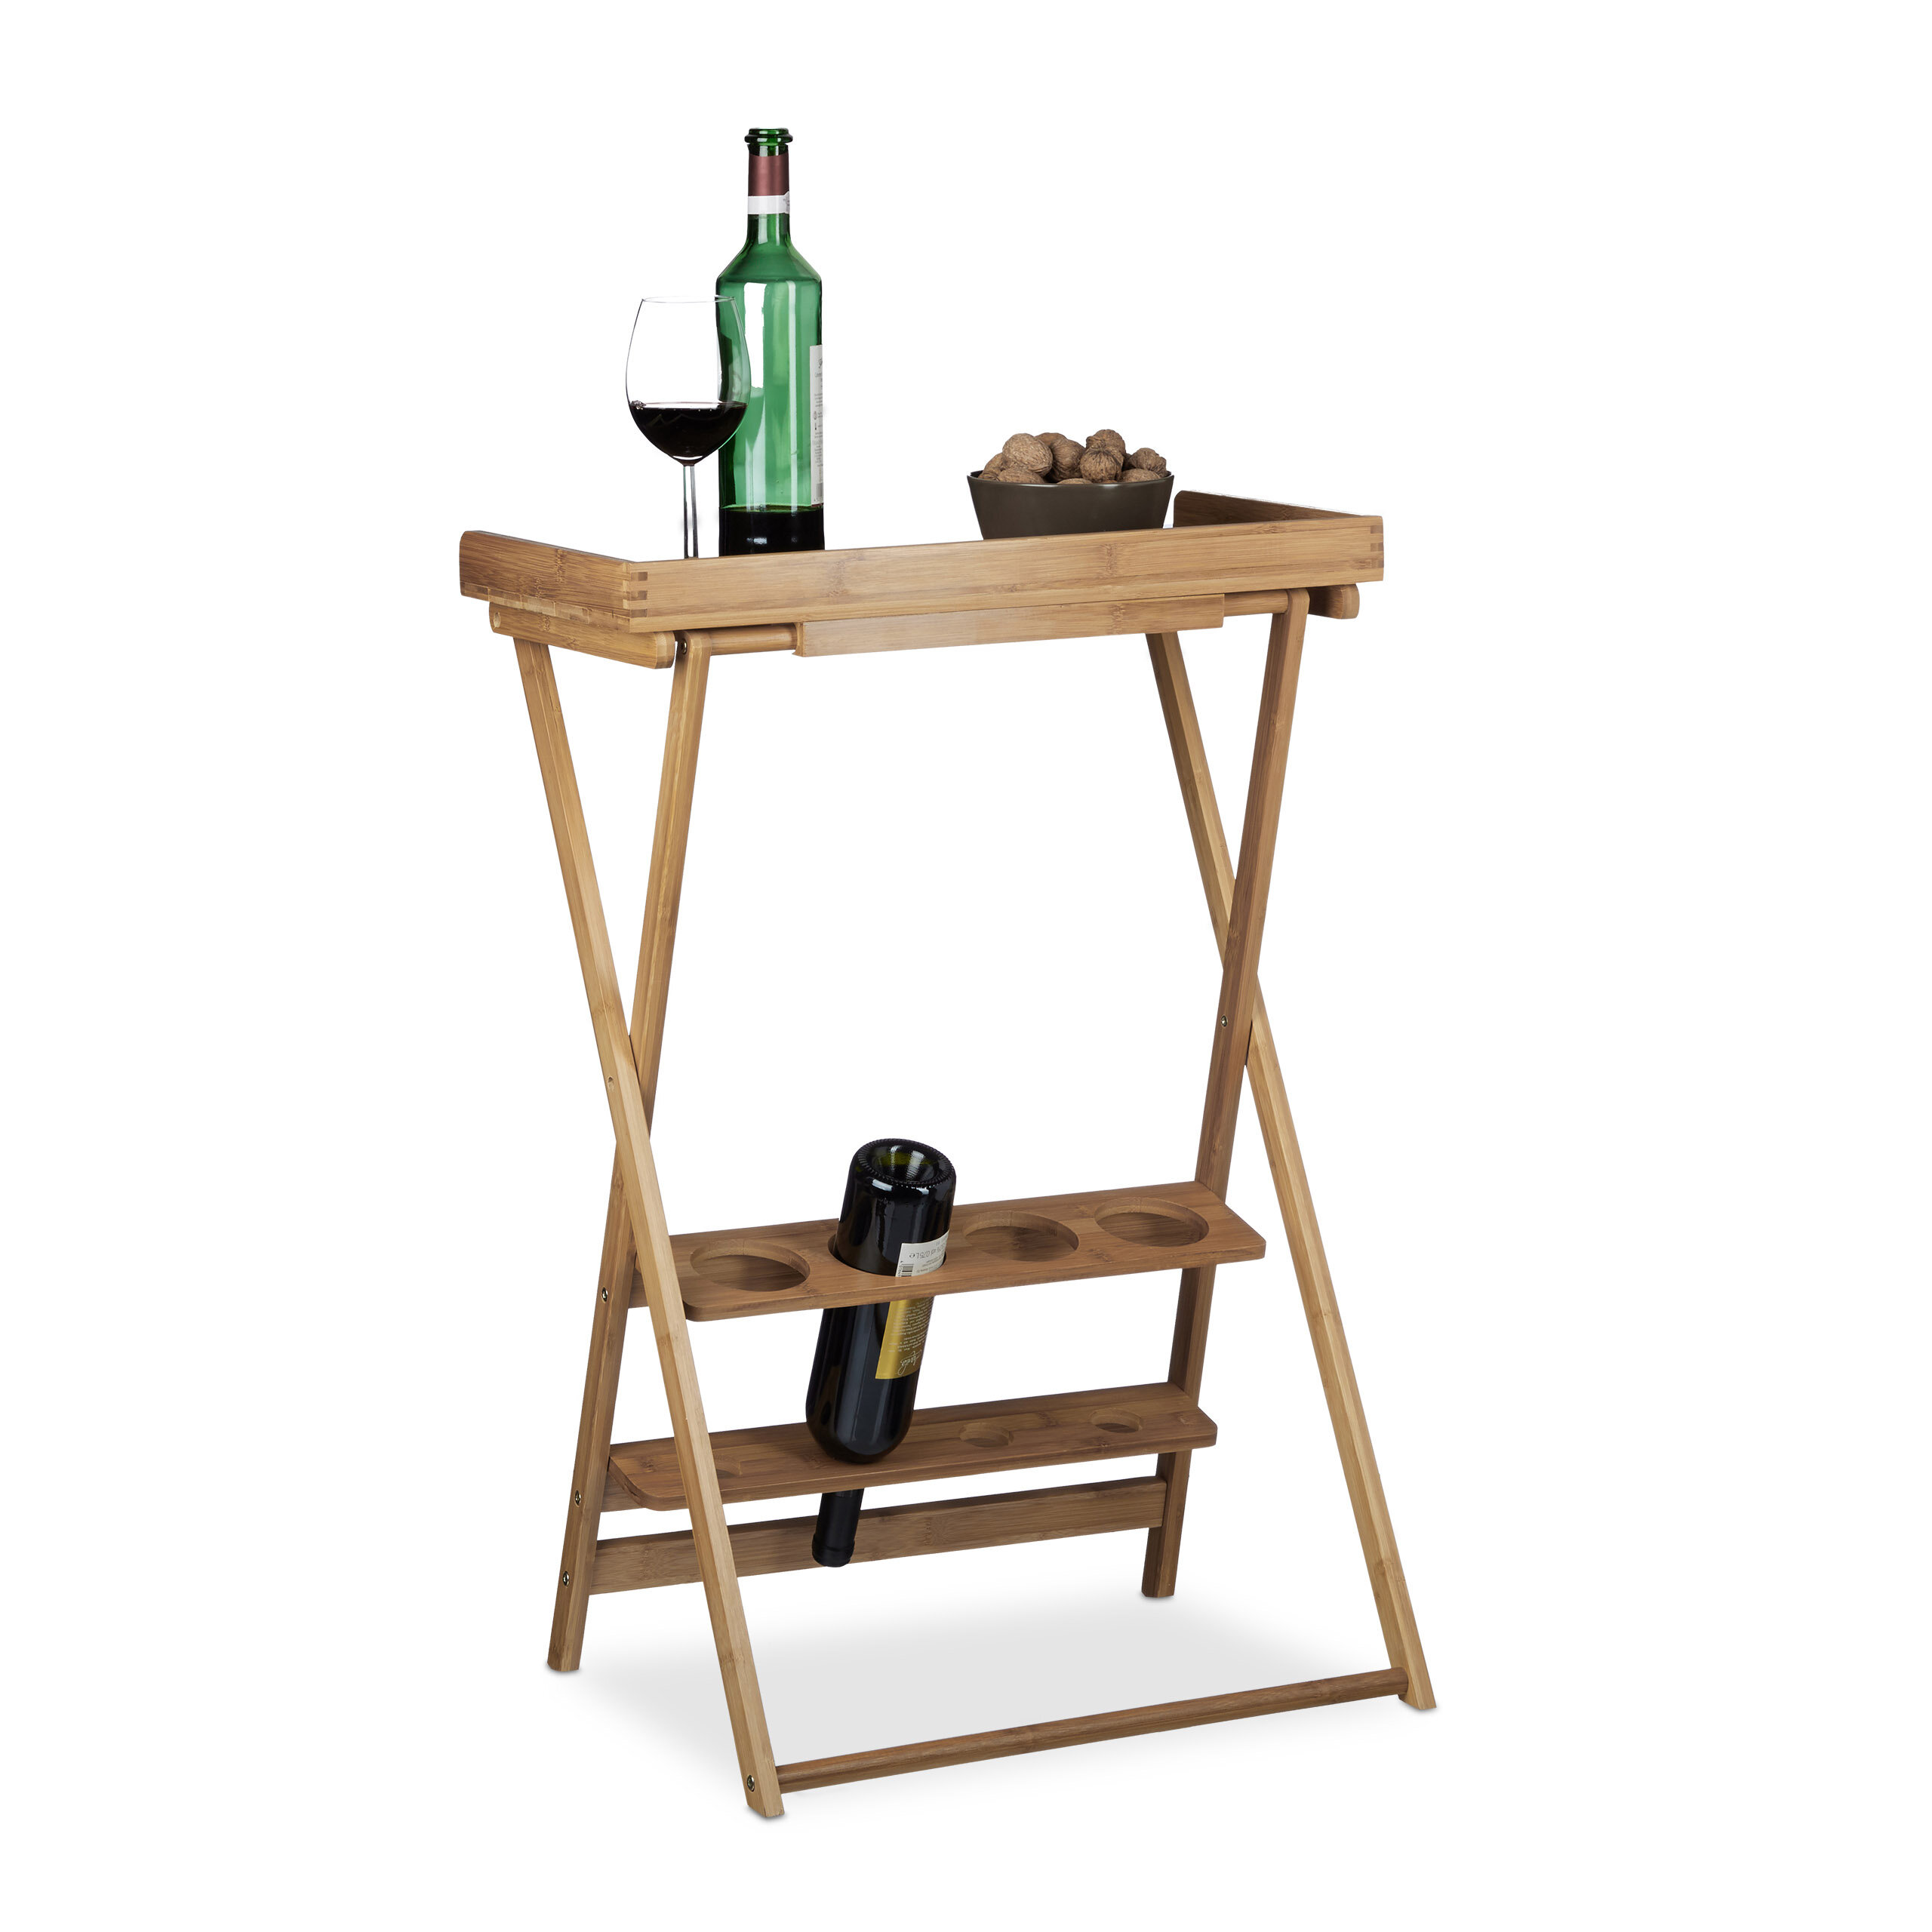 Relaxdays 4 Bottles Tabletop Wine Rack With Glass Holder Wayfaircouk